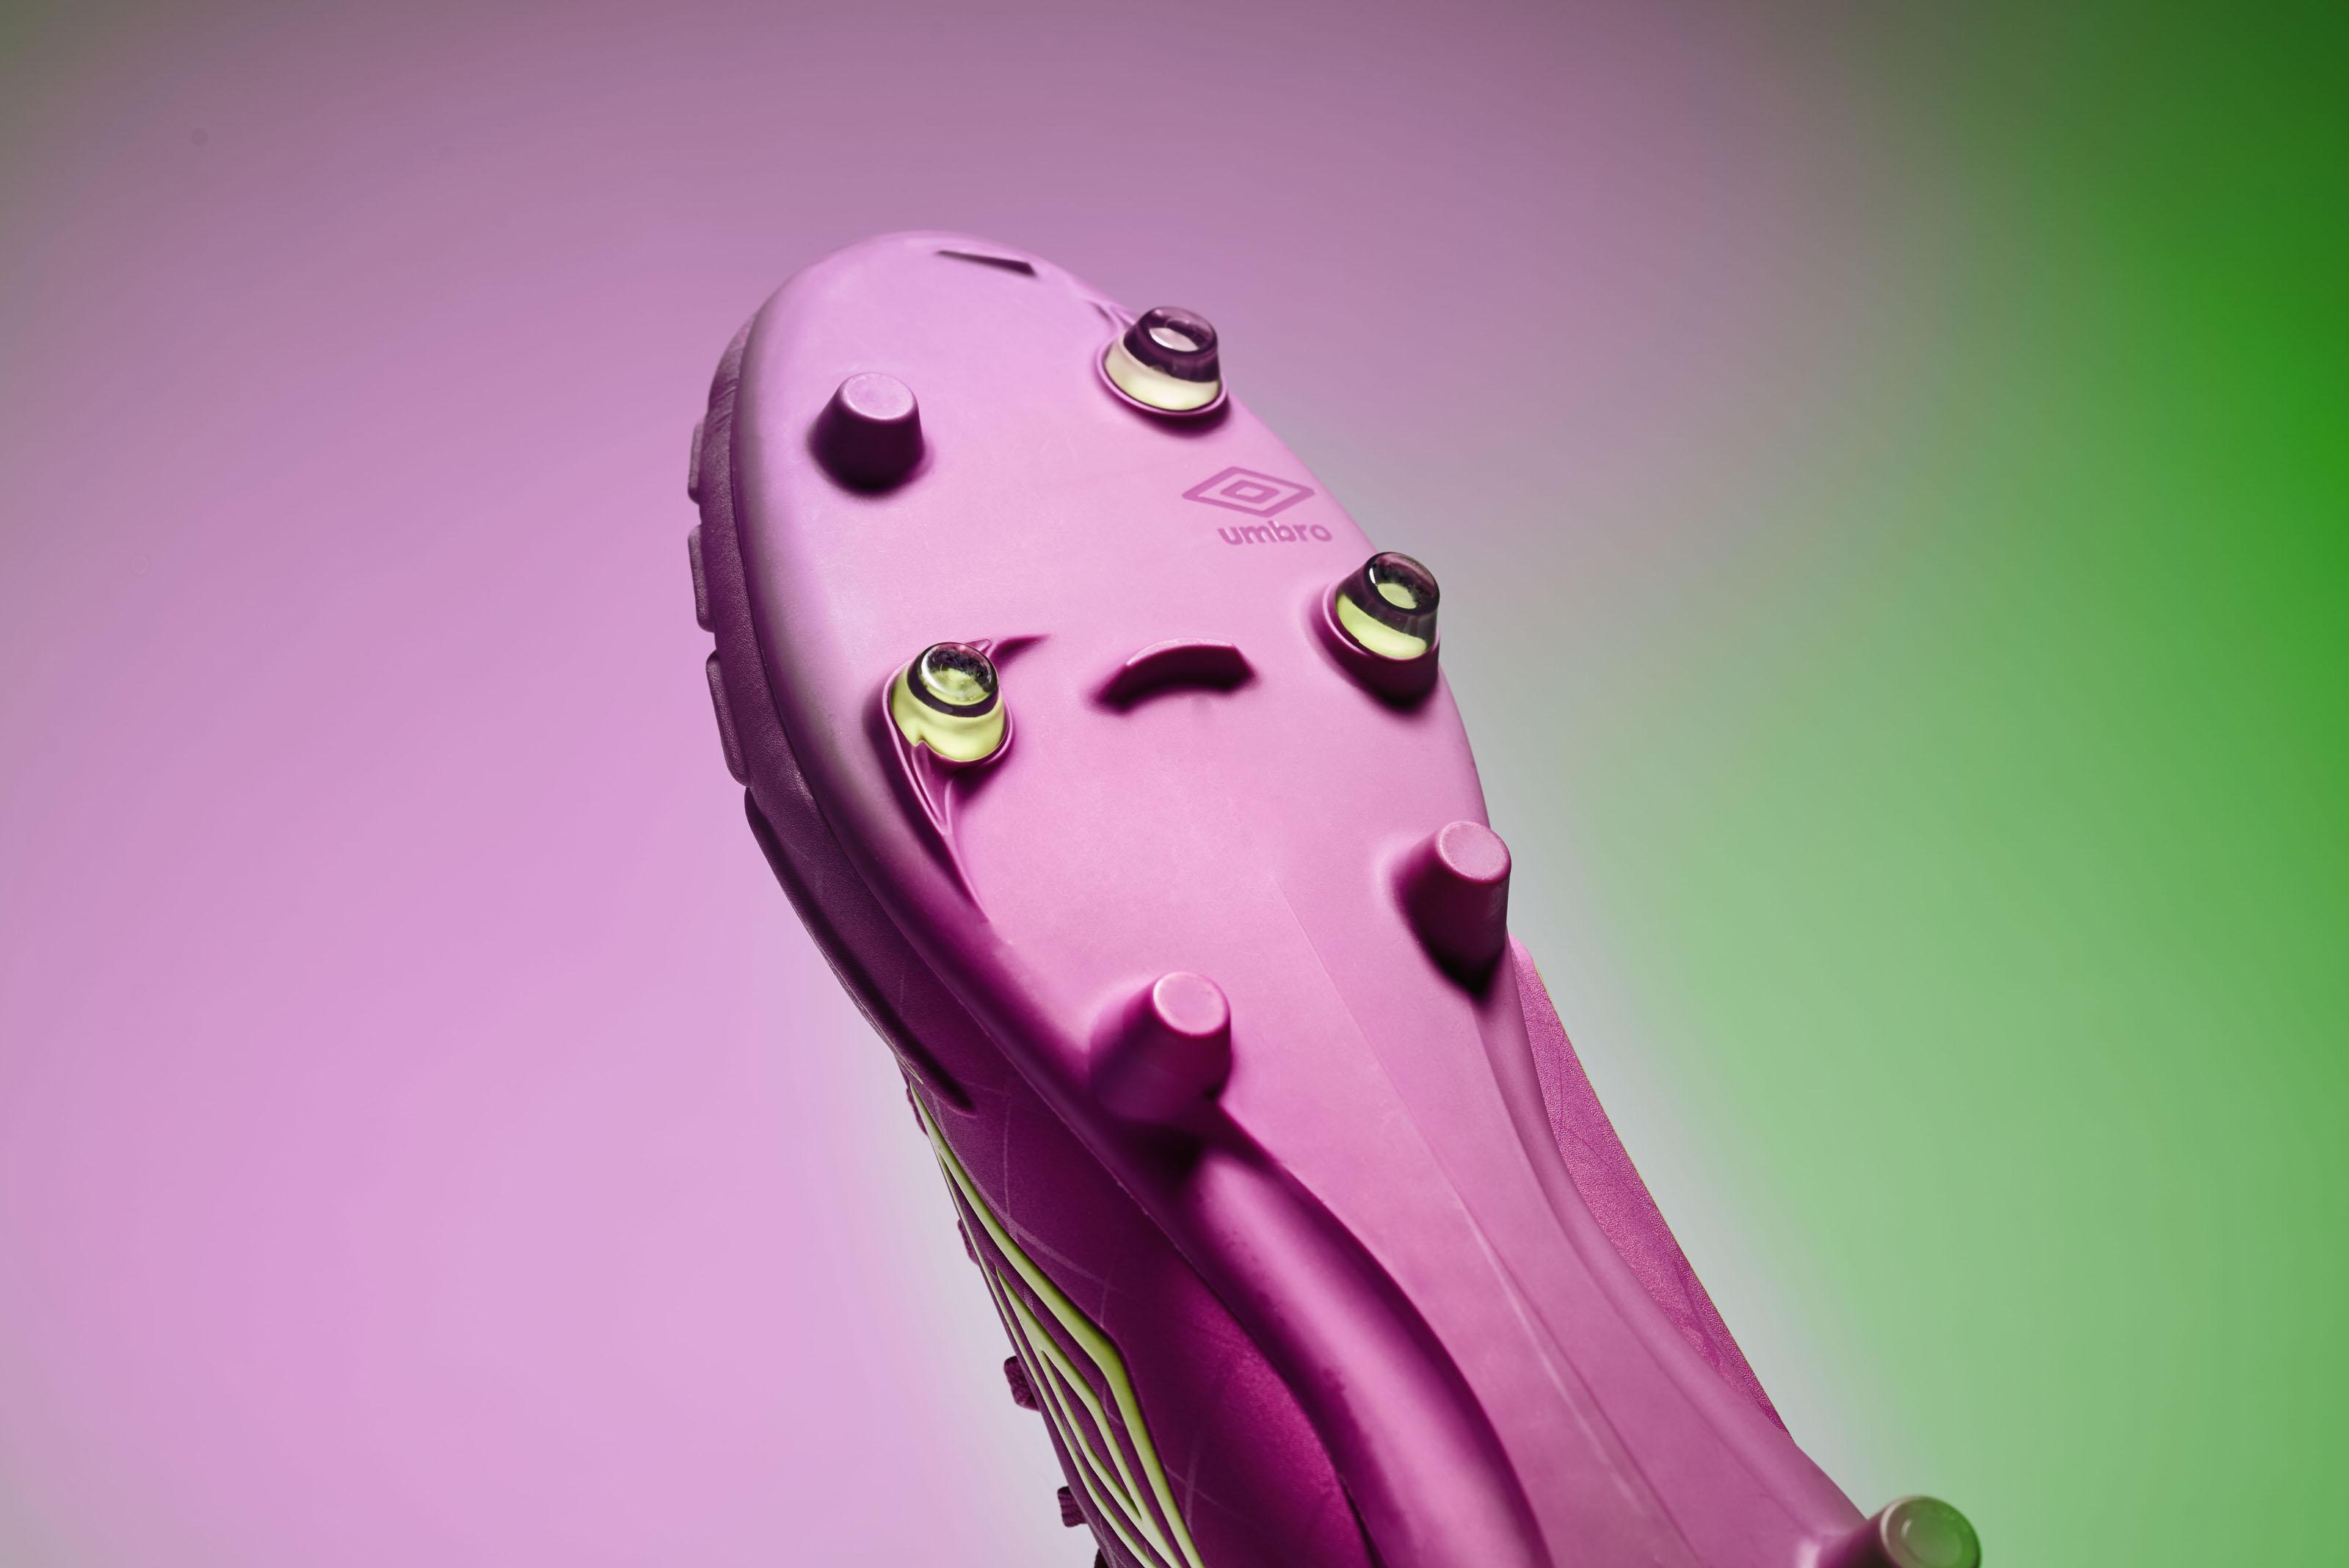 ms_umbro_aw16_accuro_purple_colour_088